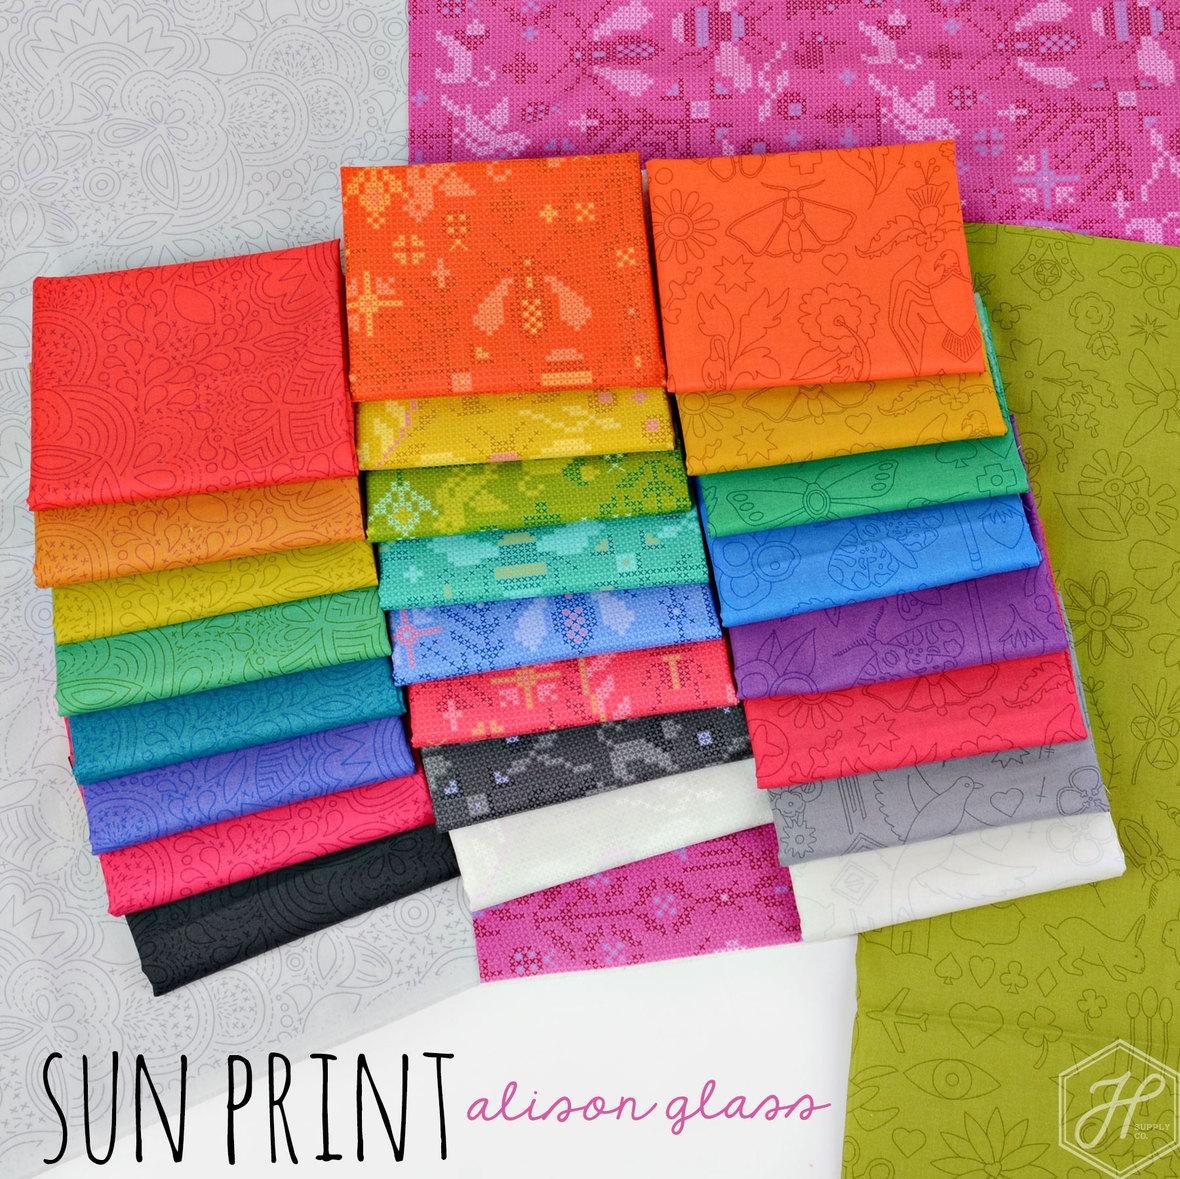 Alison Glass Sun Print 2020 hawthorne supply co